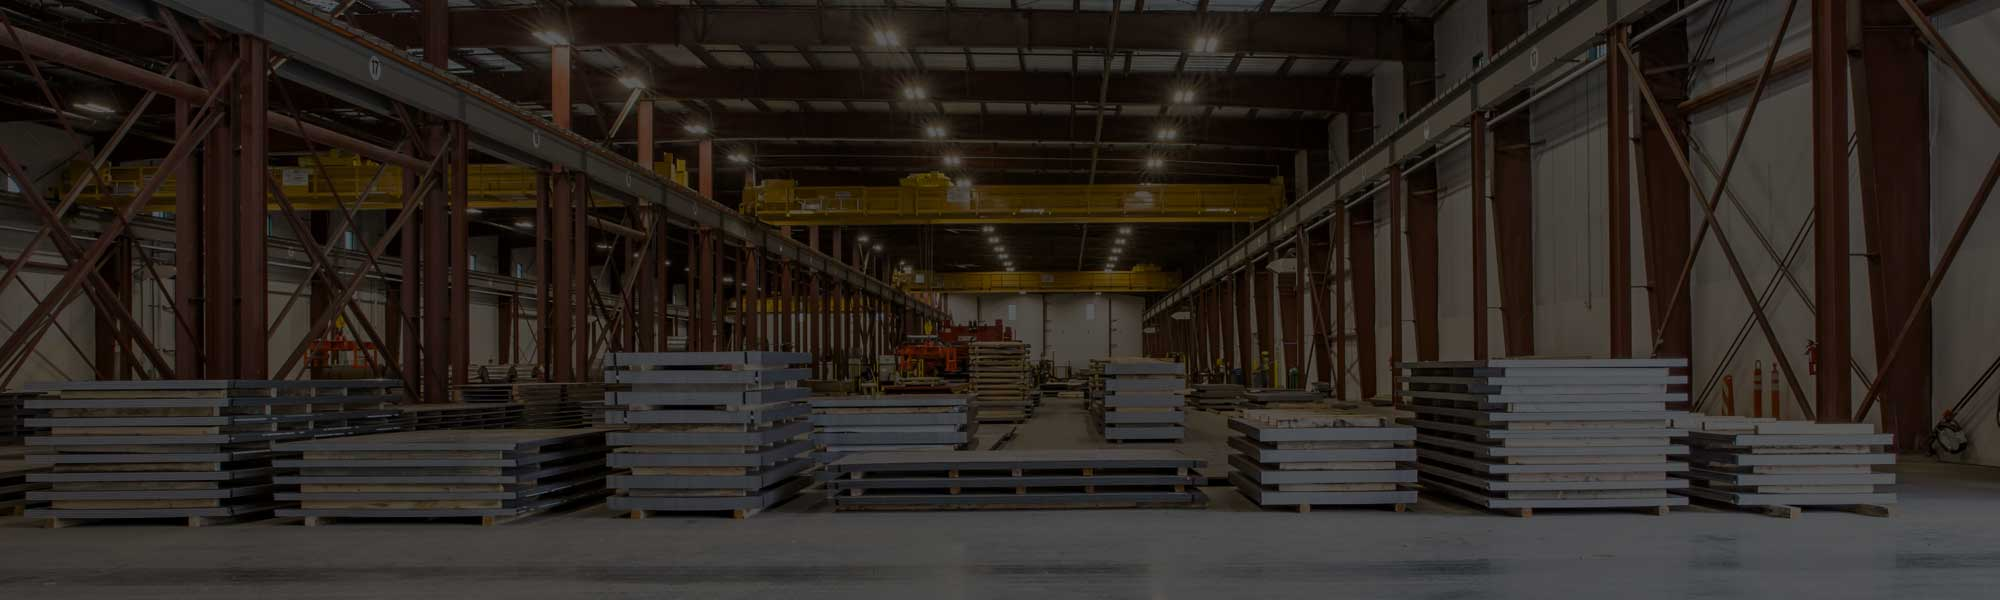 inside of a steel distribution warehouse